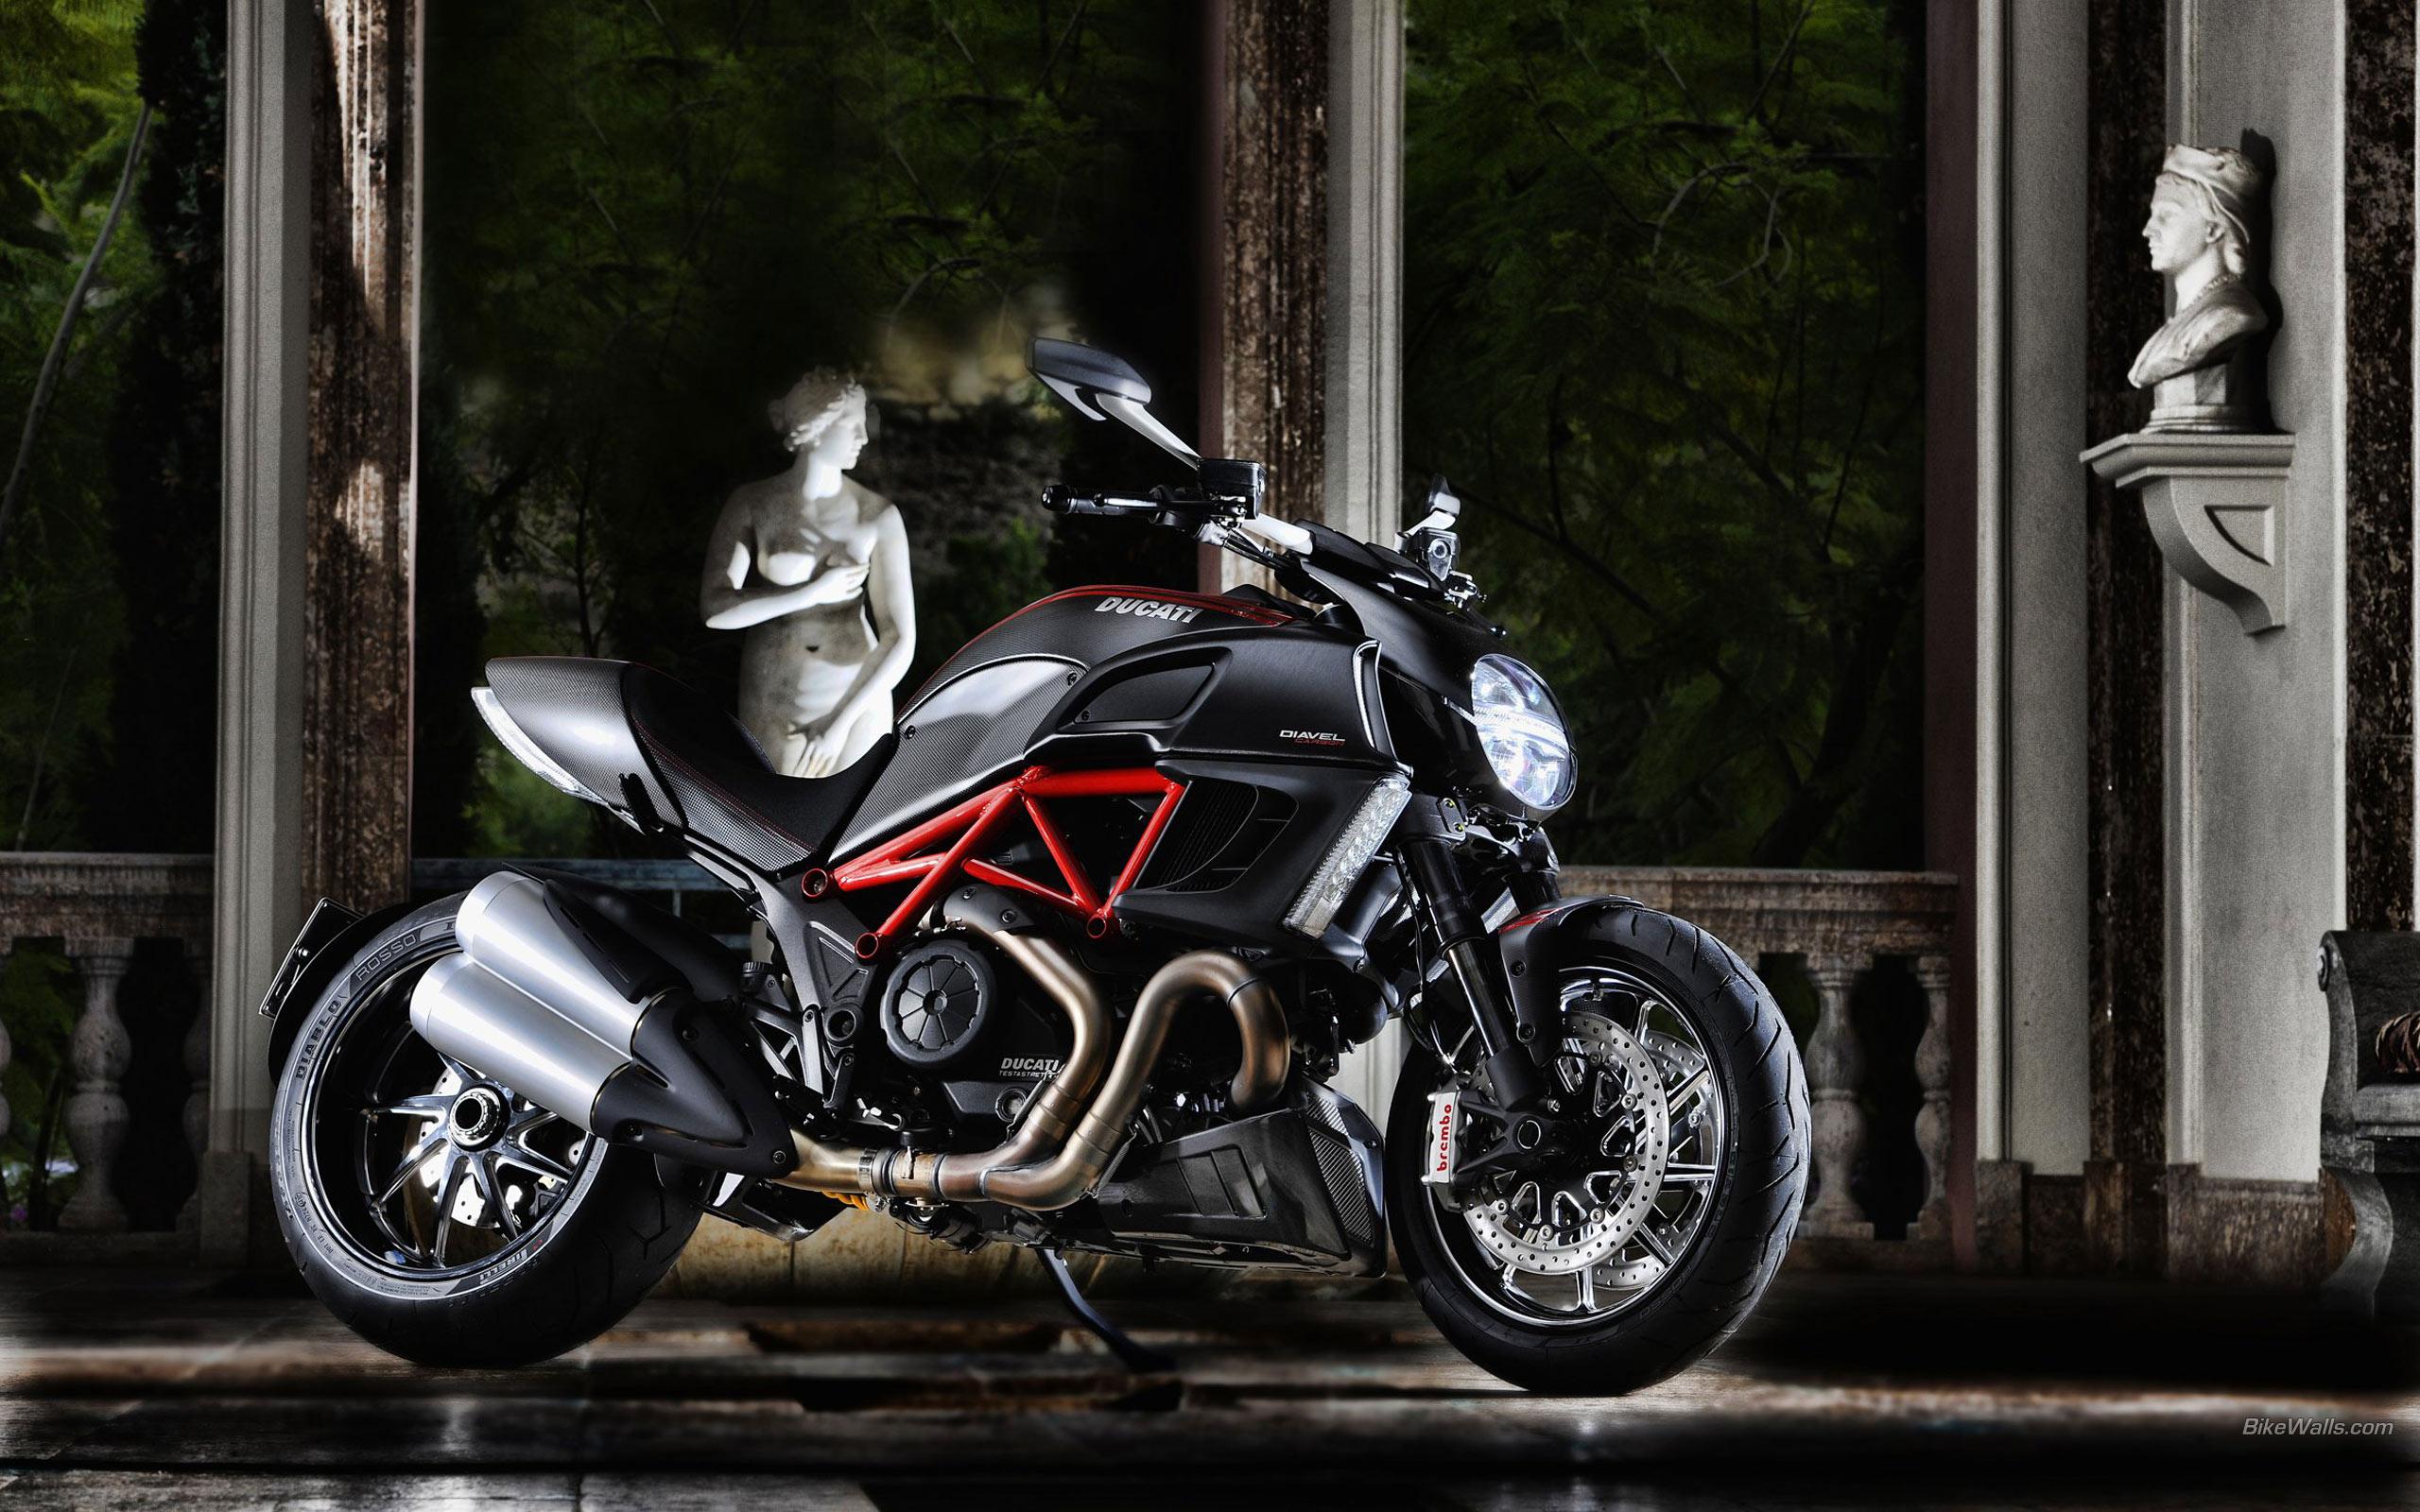 DUCATI DIAVEL   Motorcycles Wallpaper 23640702 2560x1600